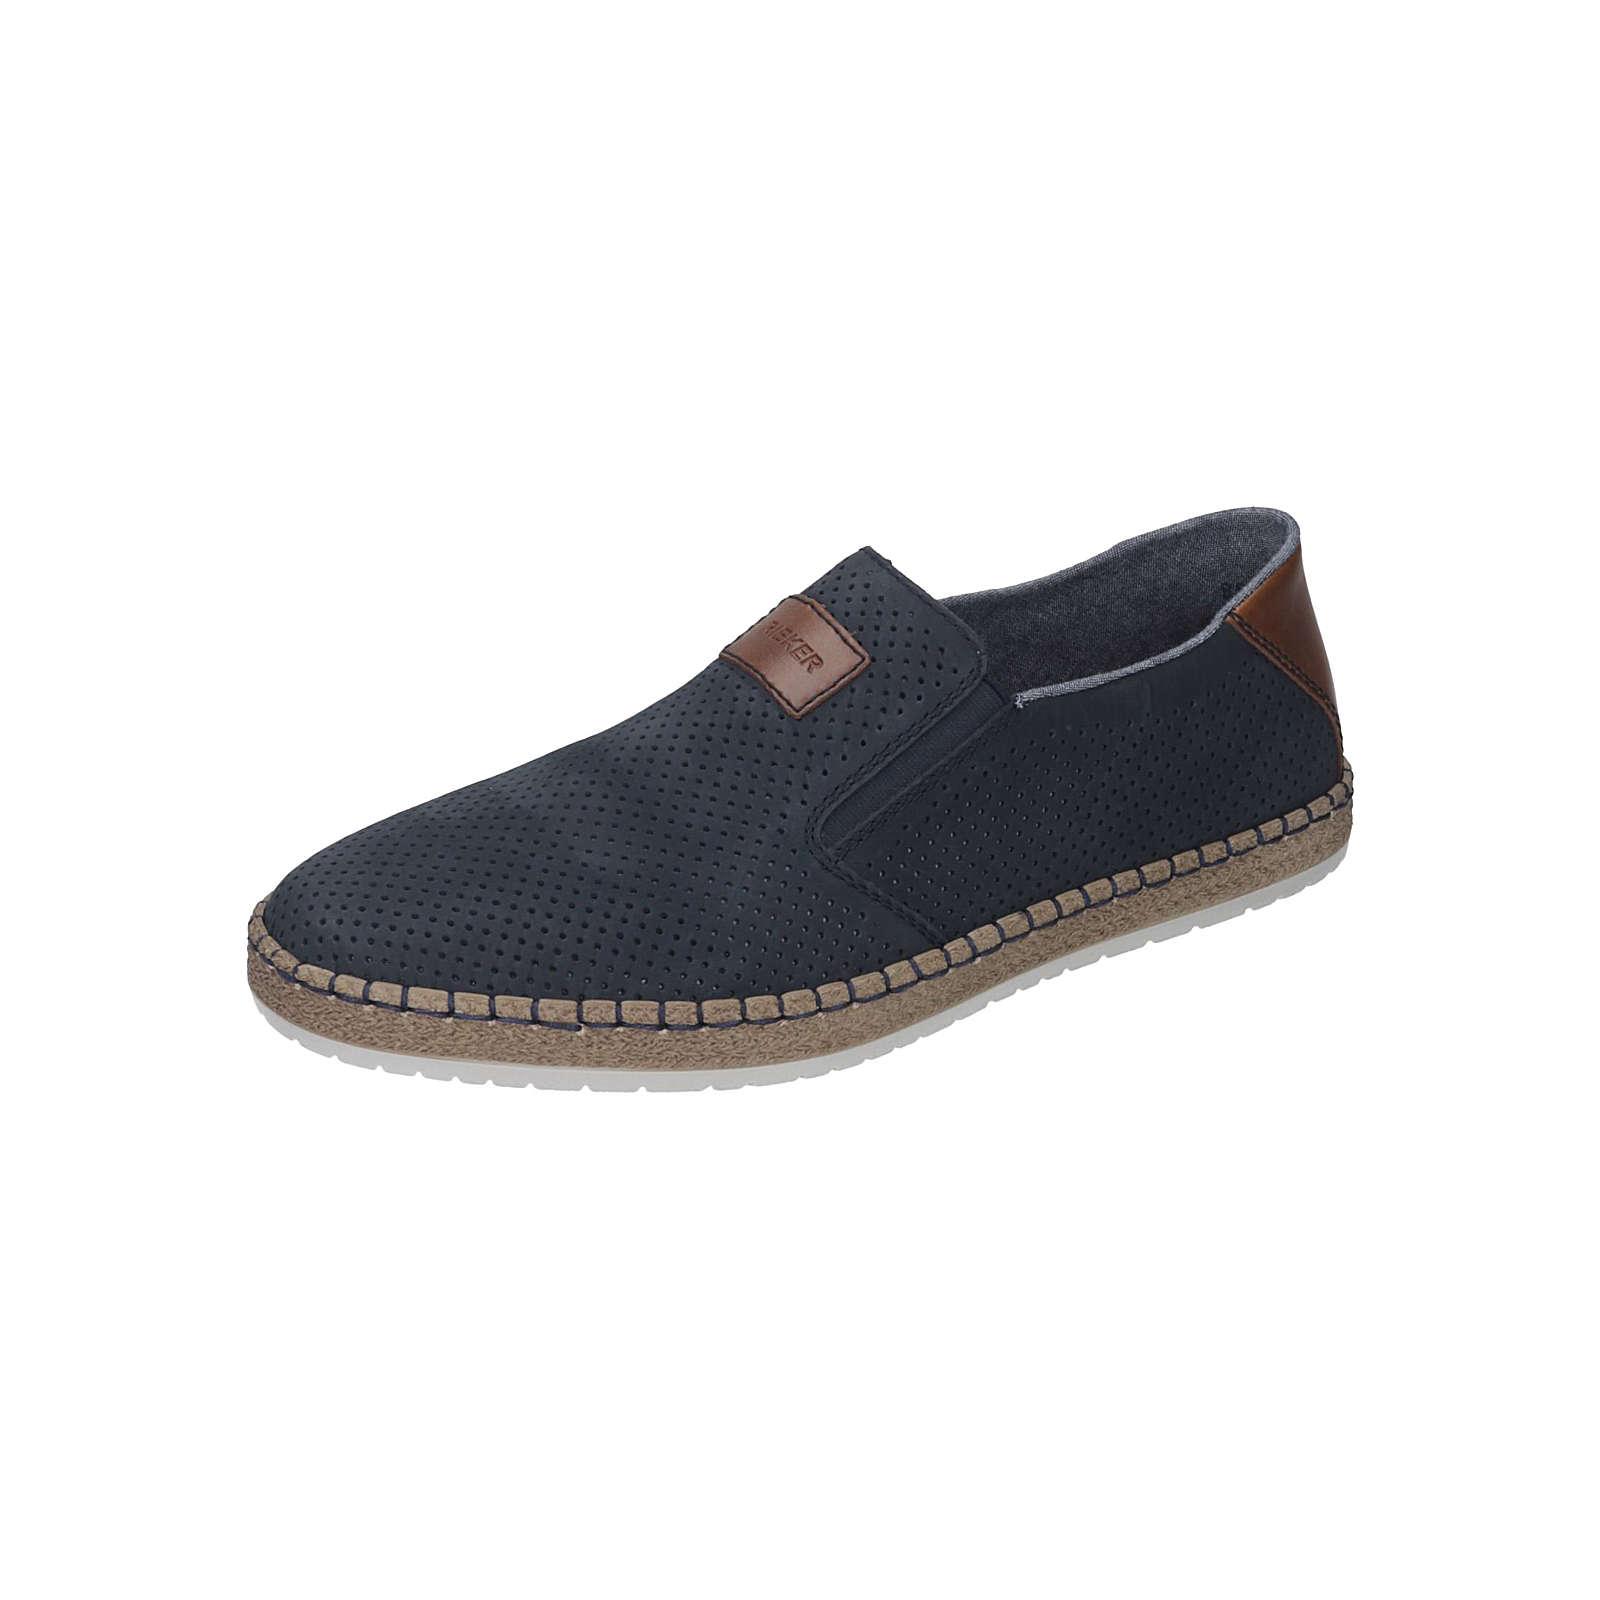 rieker herren slipper sportliche slipper blau herren gr 40. Black Bedroom Furniture Sets. Home Design Ideas